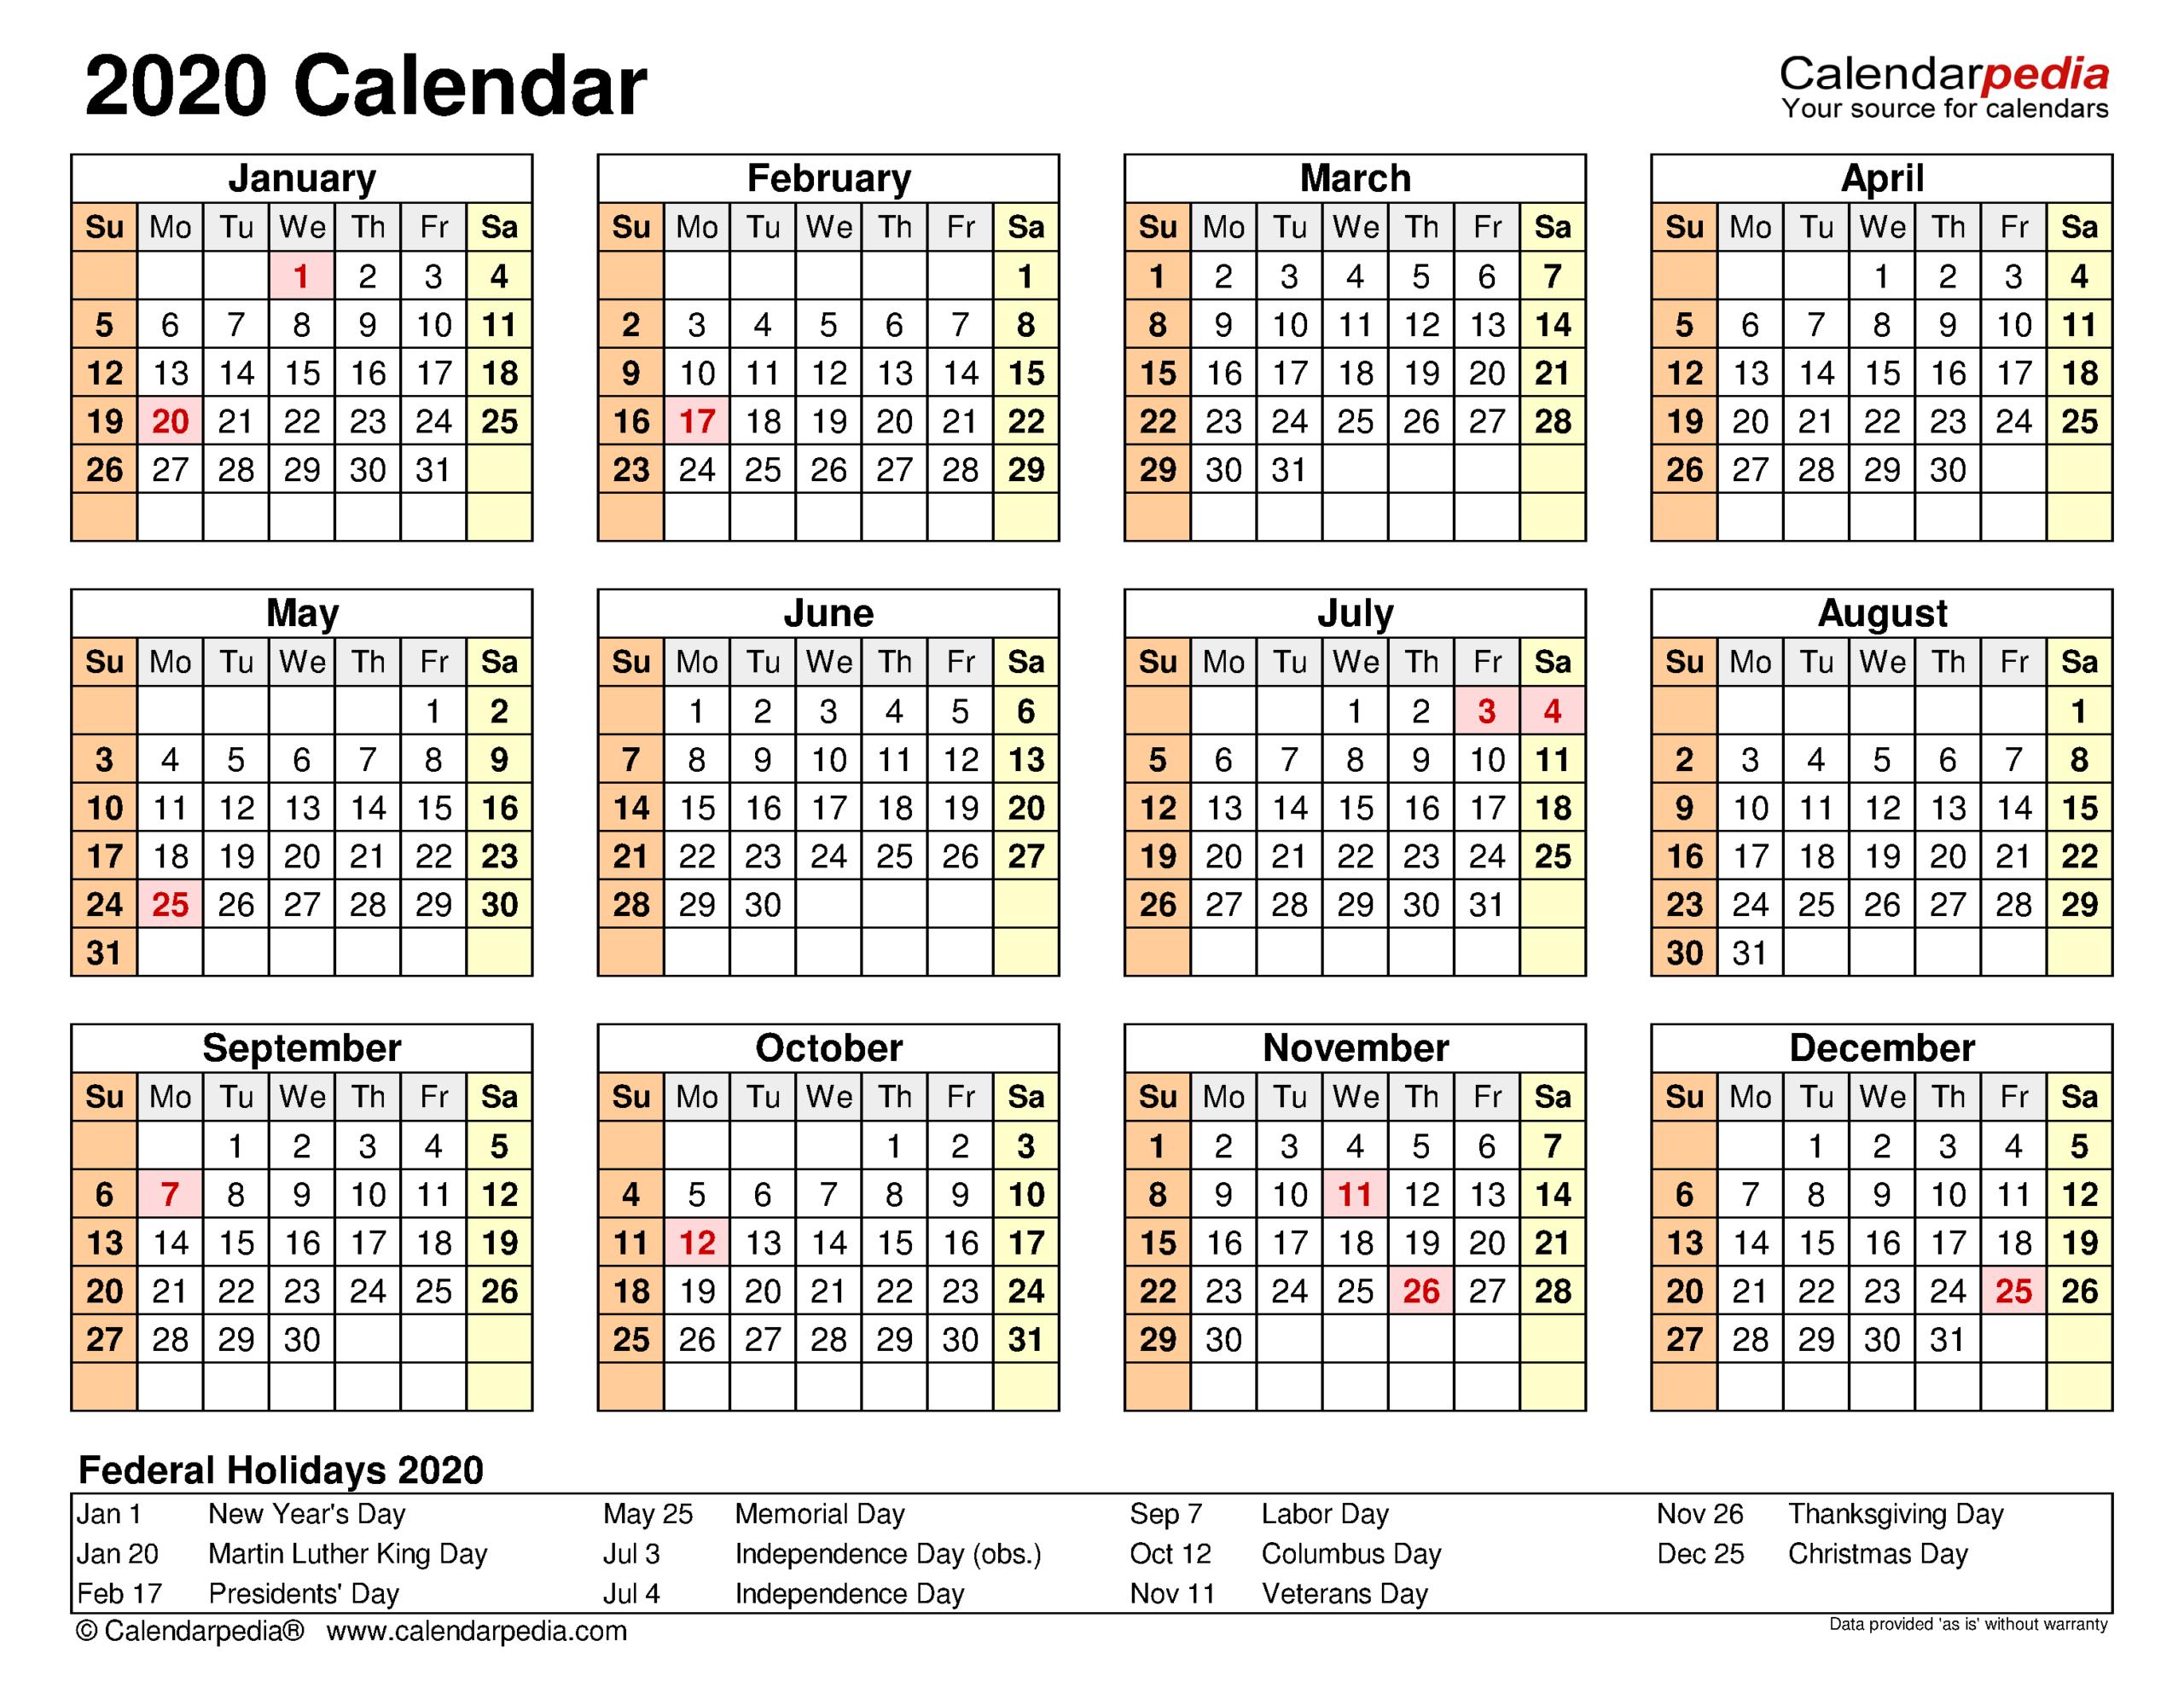 2020 Calendar - Free Printable Excel Templates - Calendarpedia